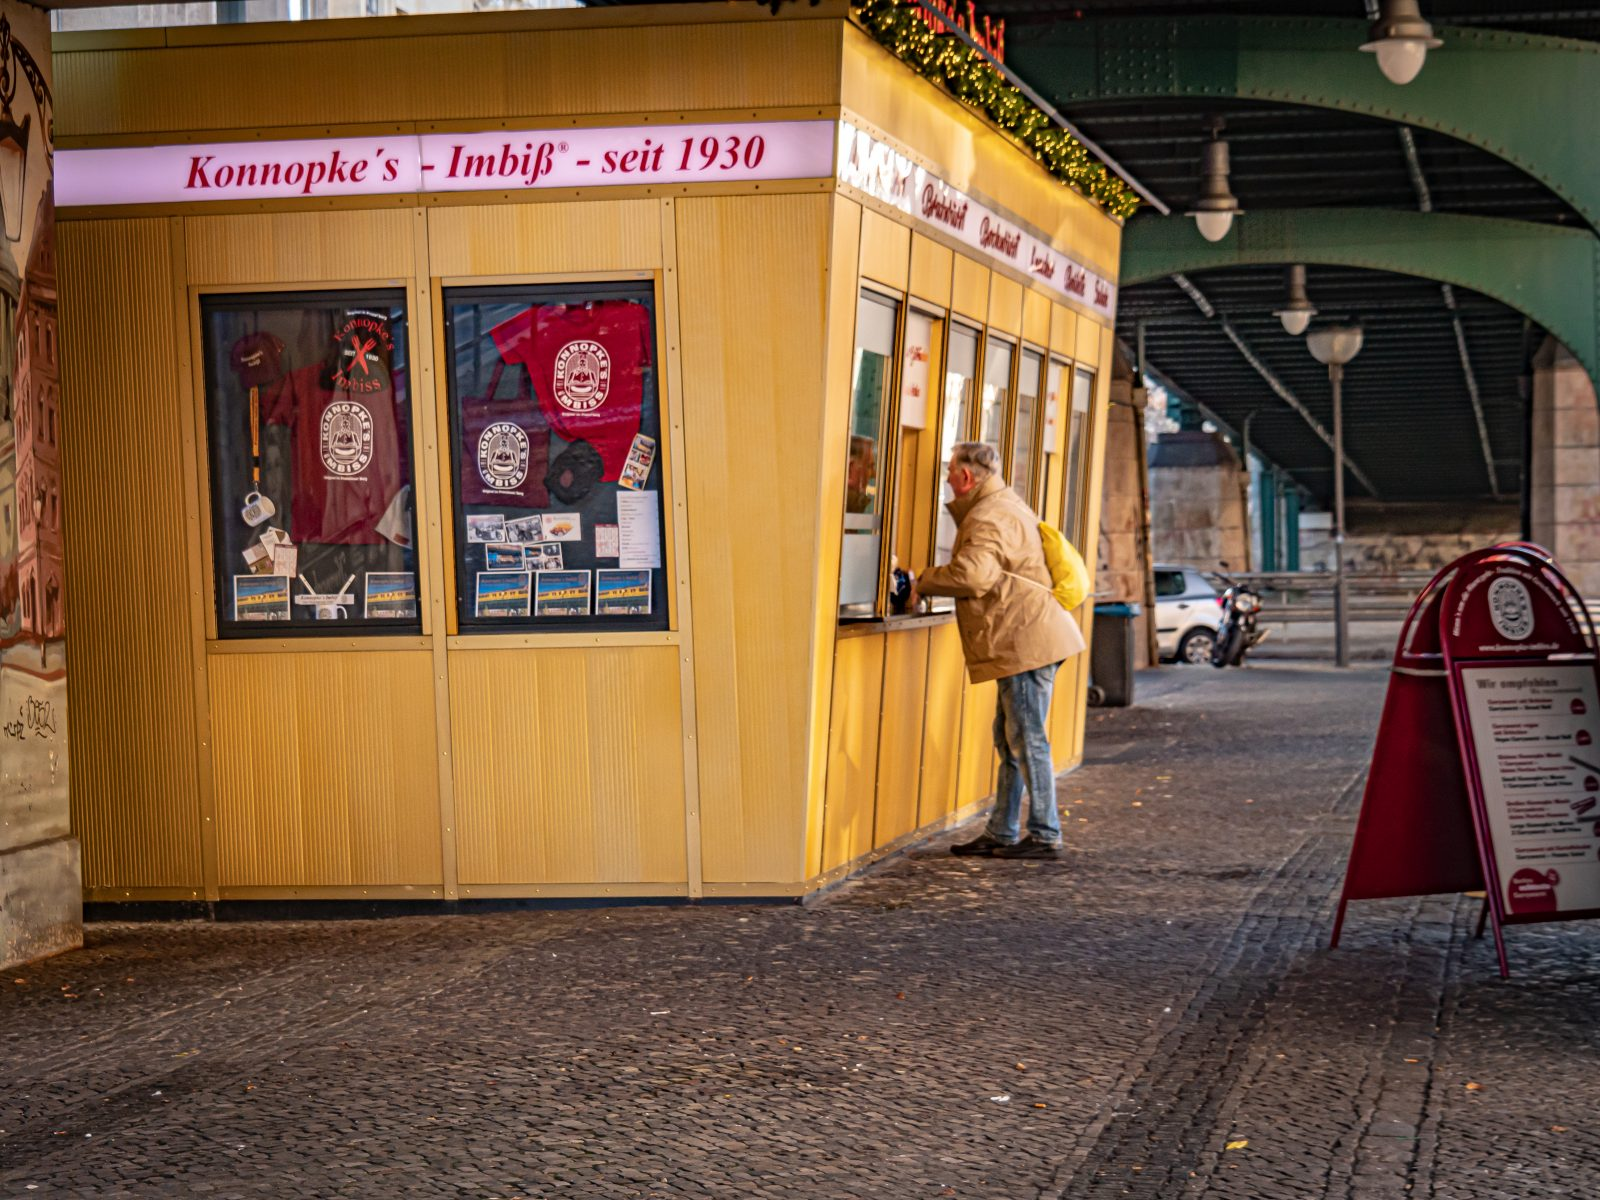 Imbisse in Berlin Konnopke